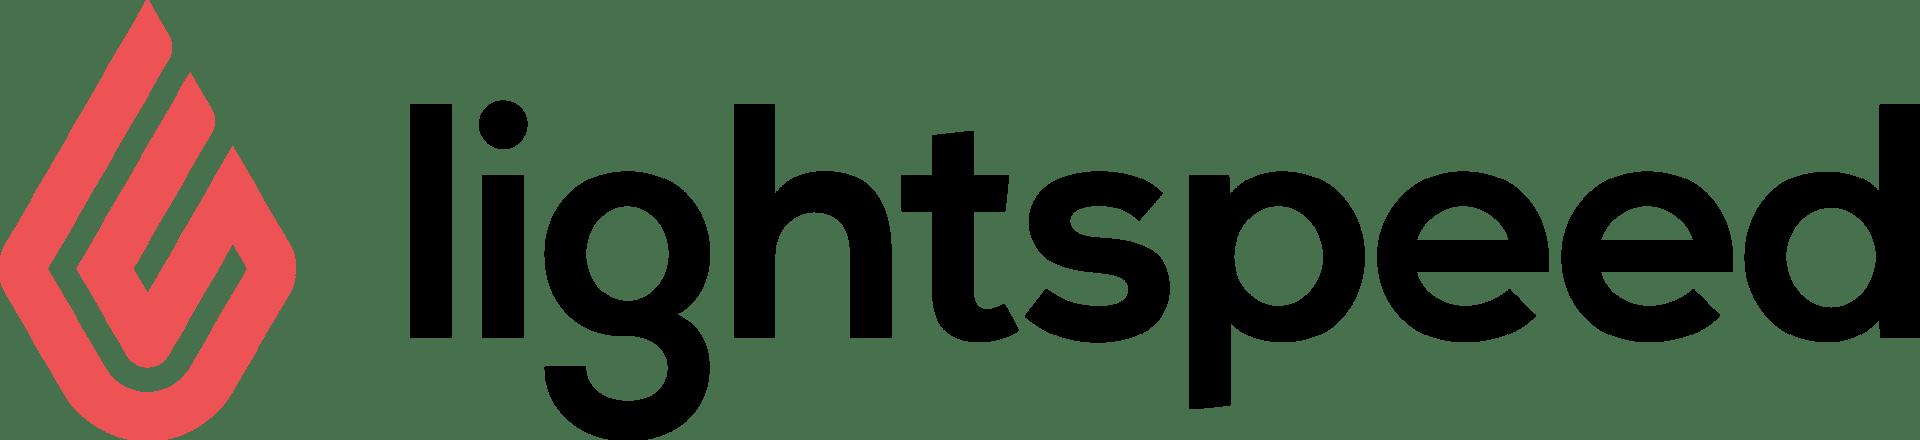 Zendesk Lightspeed Case Study